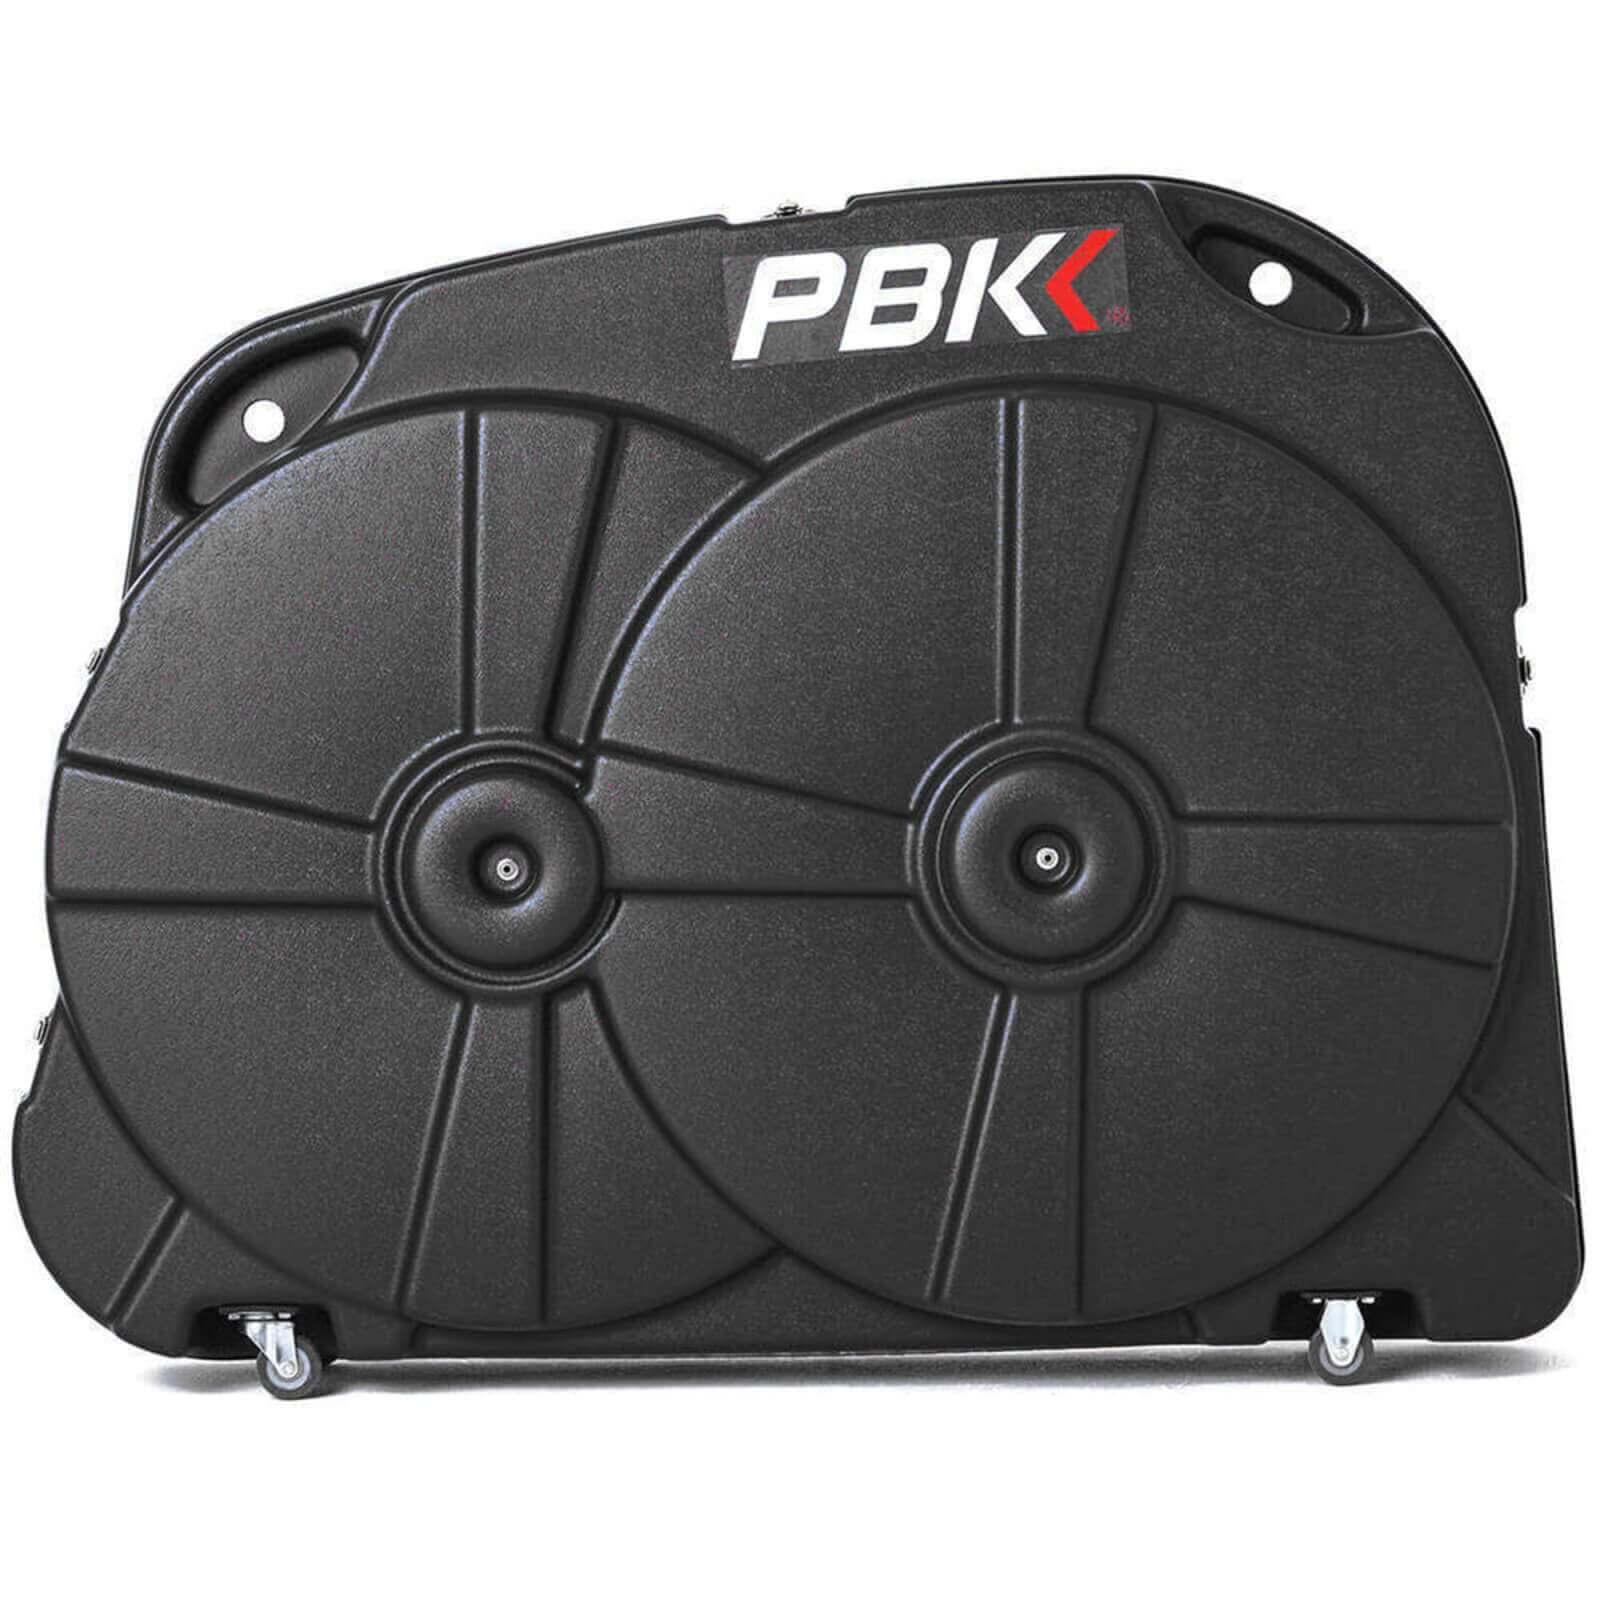 PBK Bike Travel Case - Black;